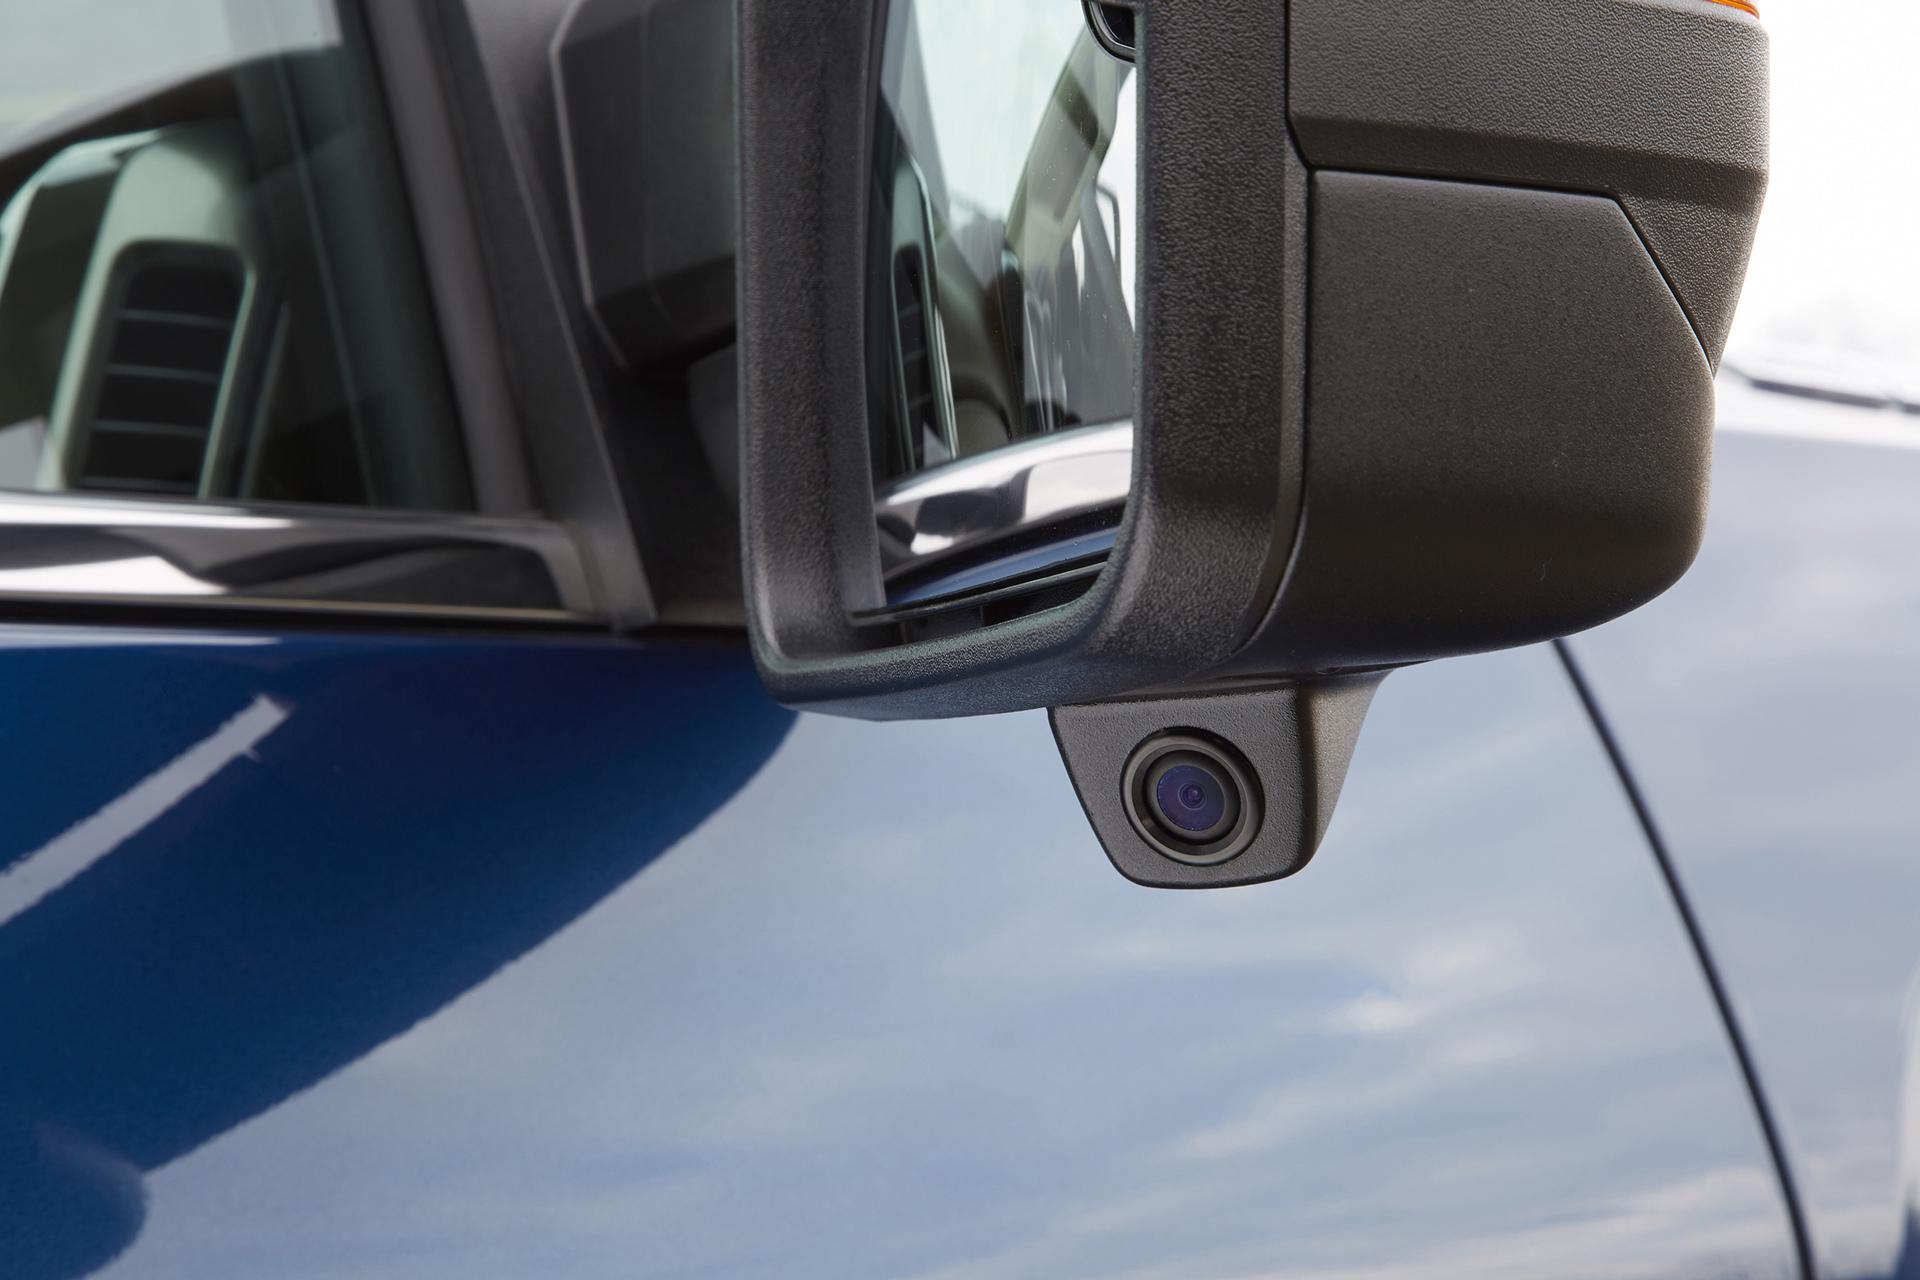 2016 GMC Sierra HD Accessories © General Motors